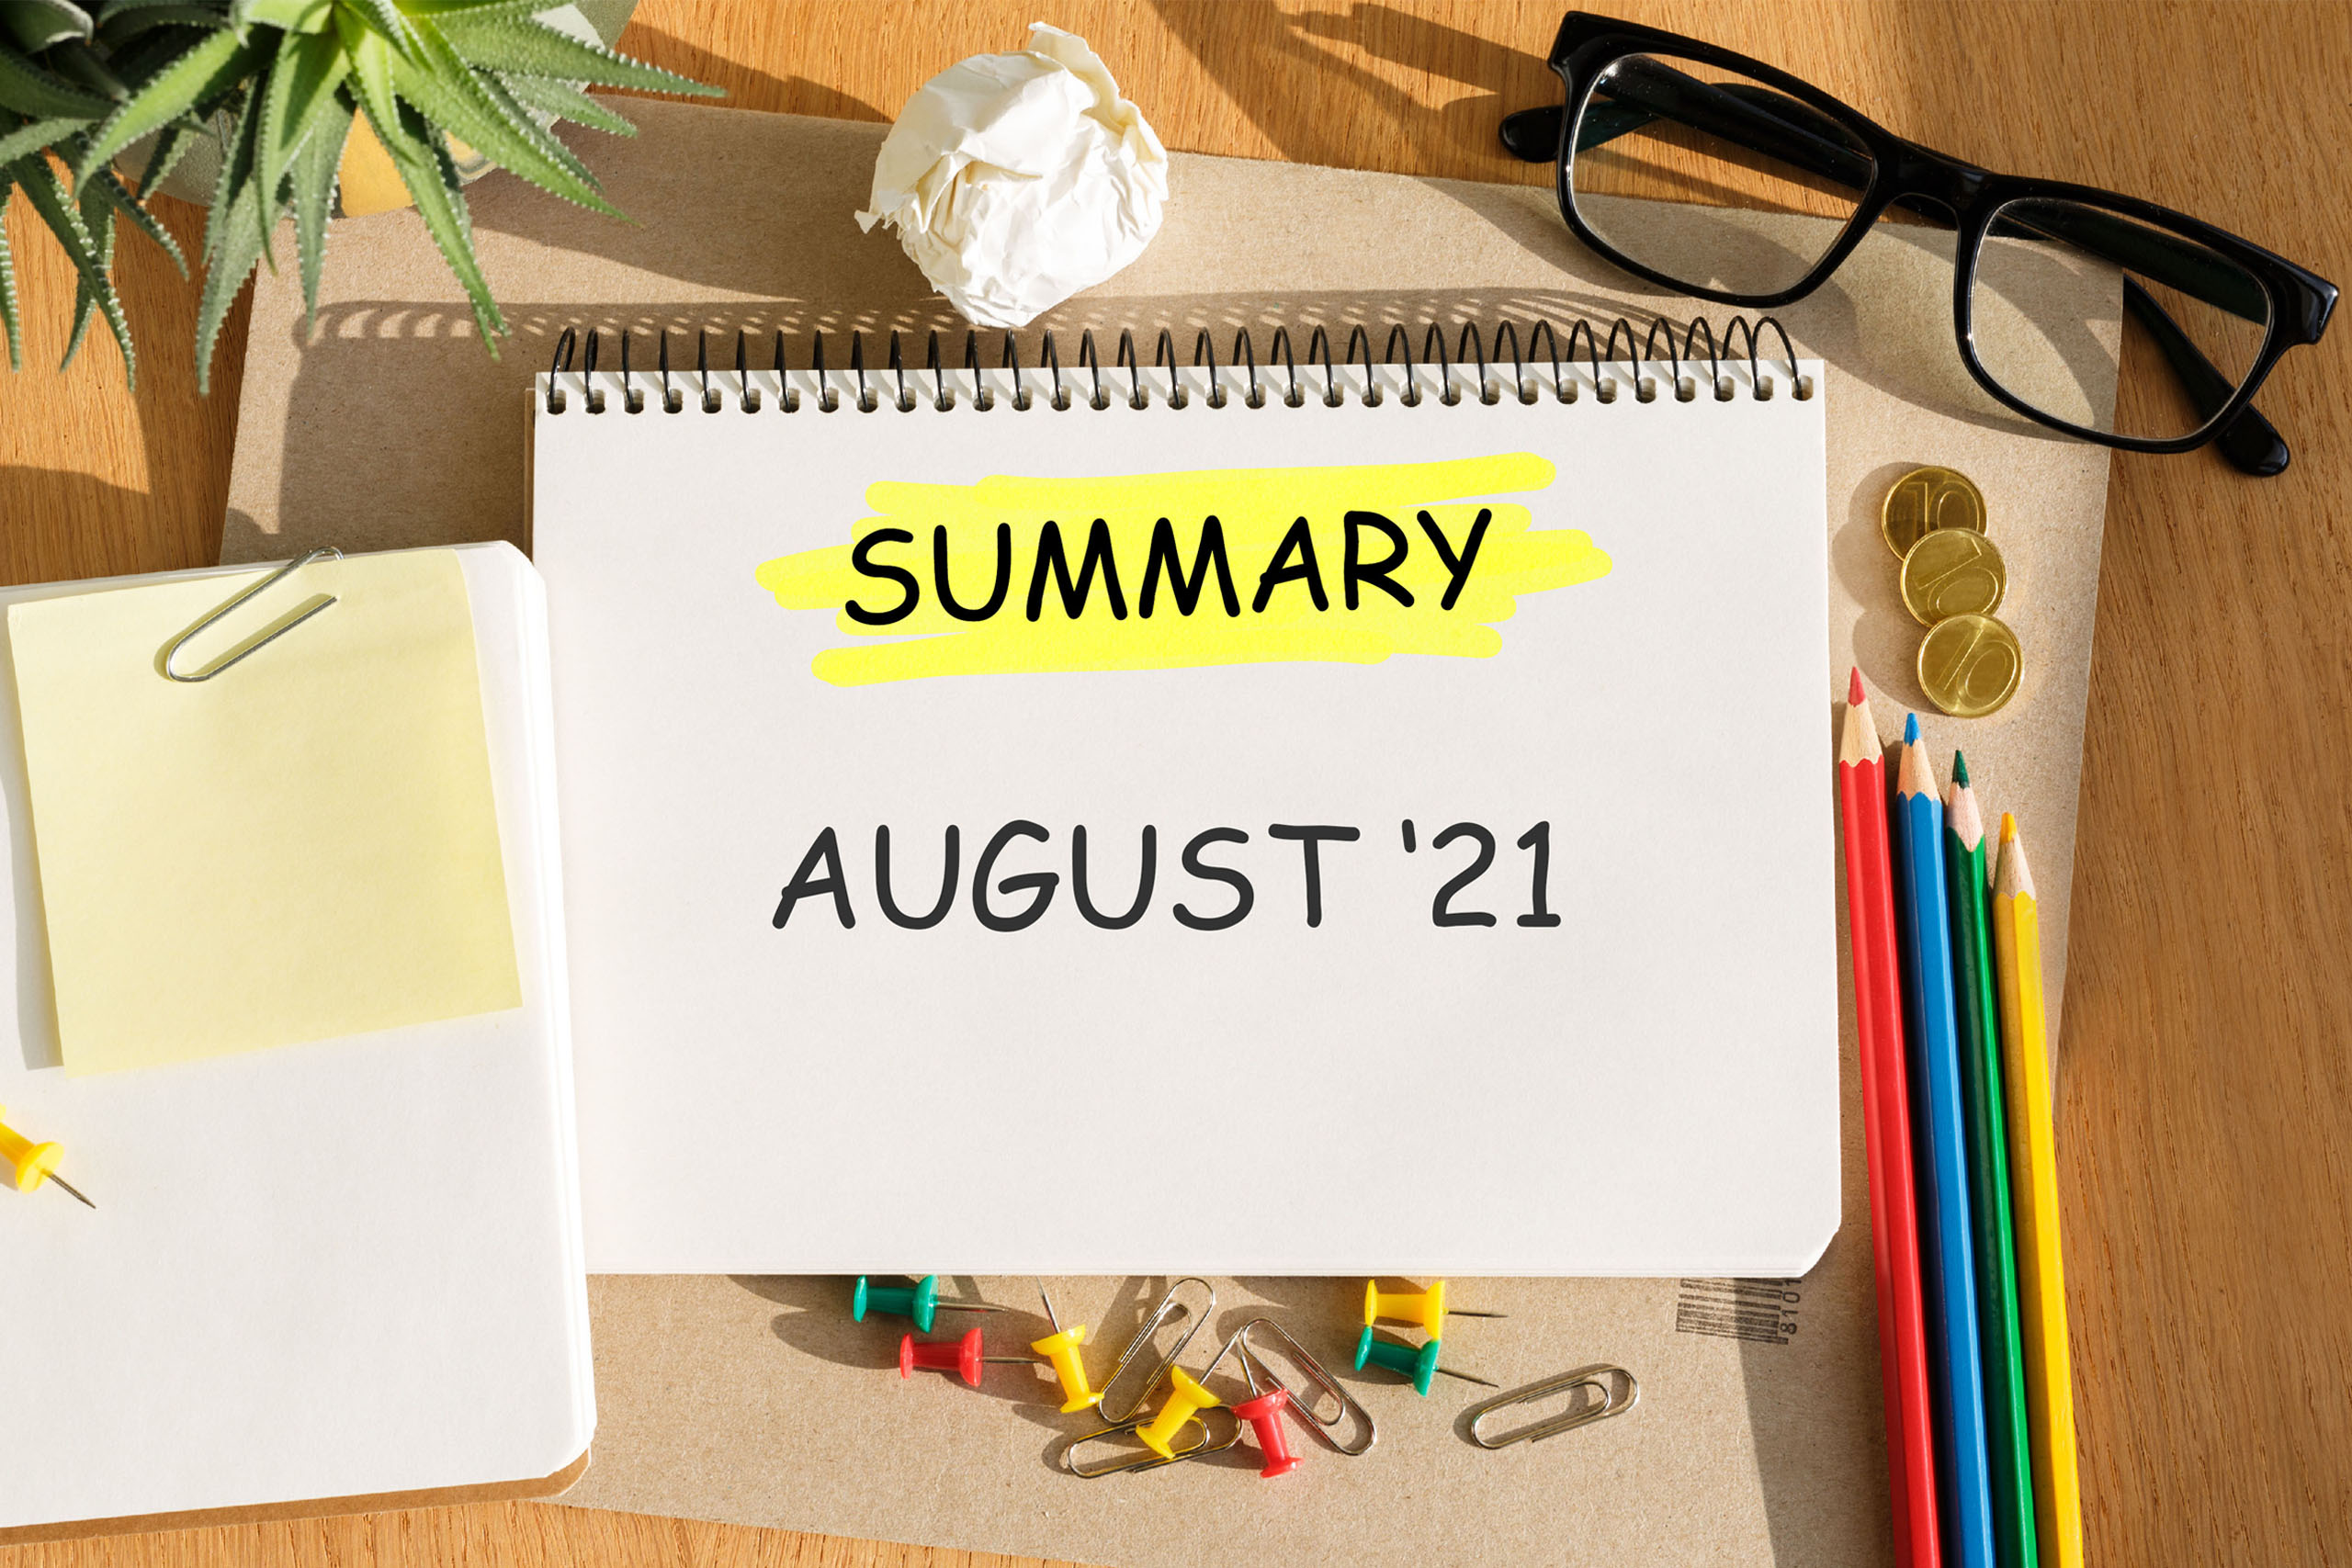 App Summary August 21